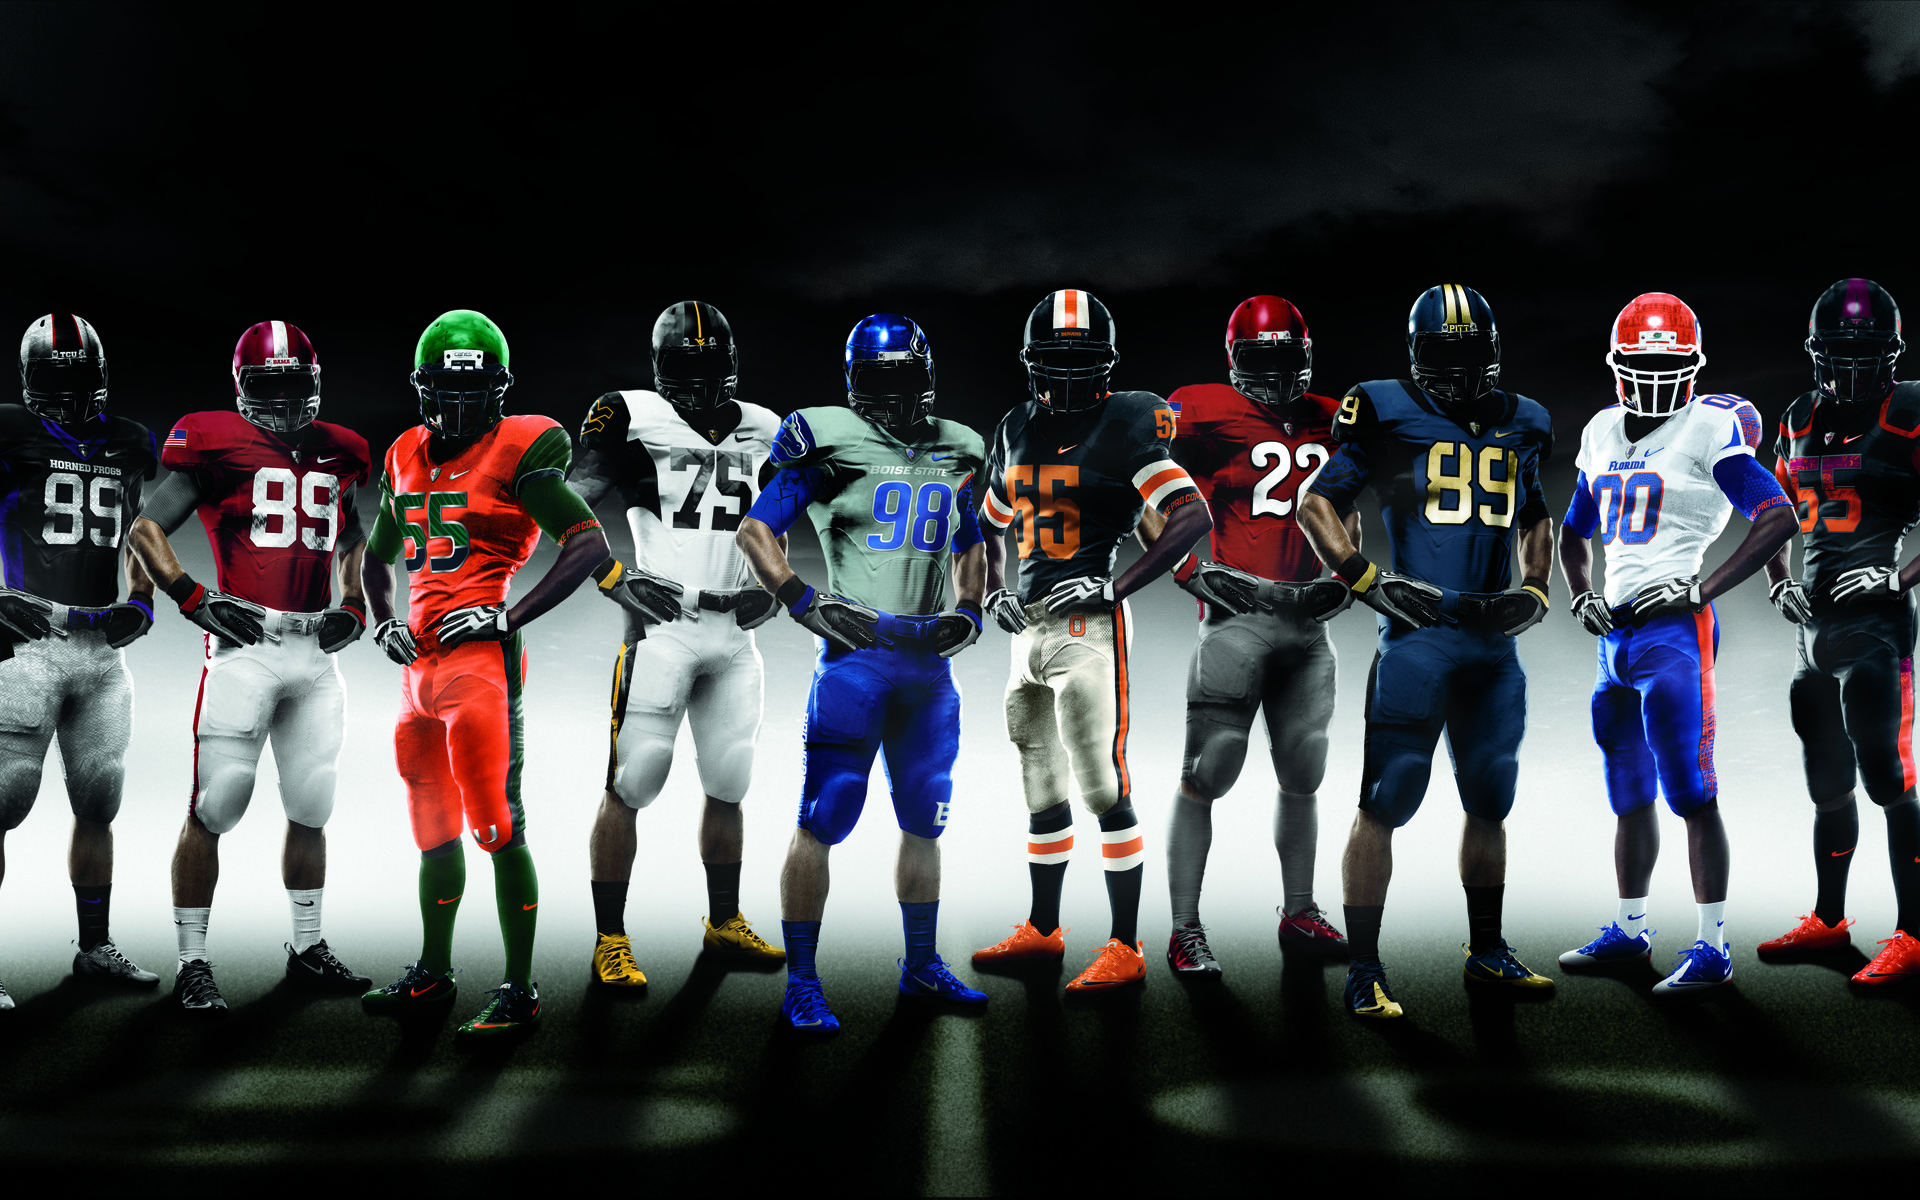 College Football Wallpaper NCAA Nike Pro combat in 2010 1920x1200